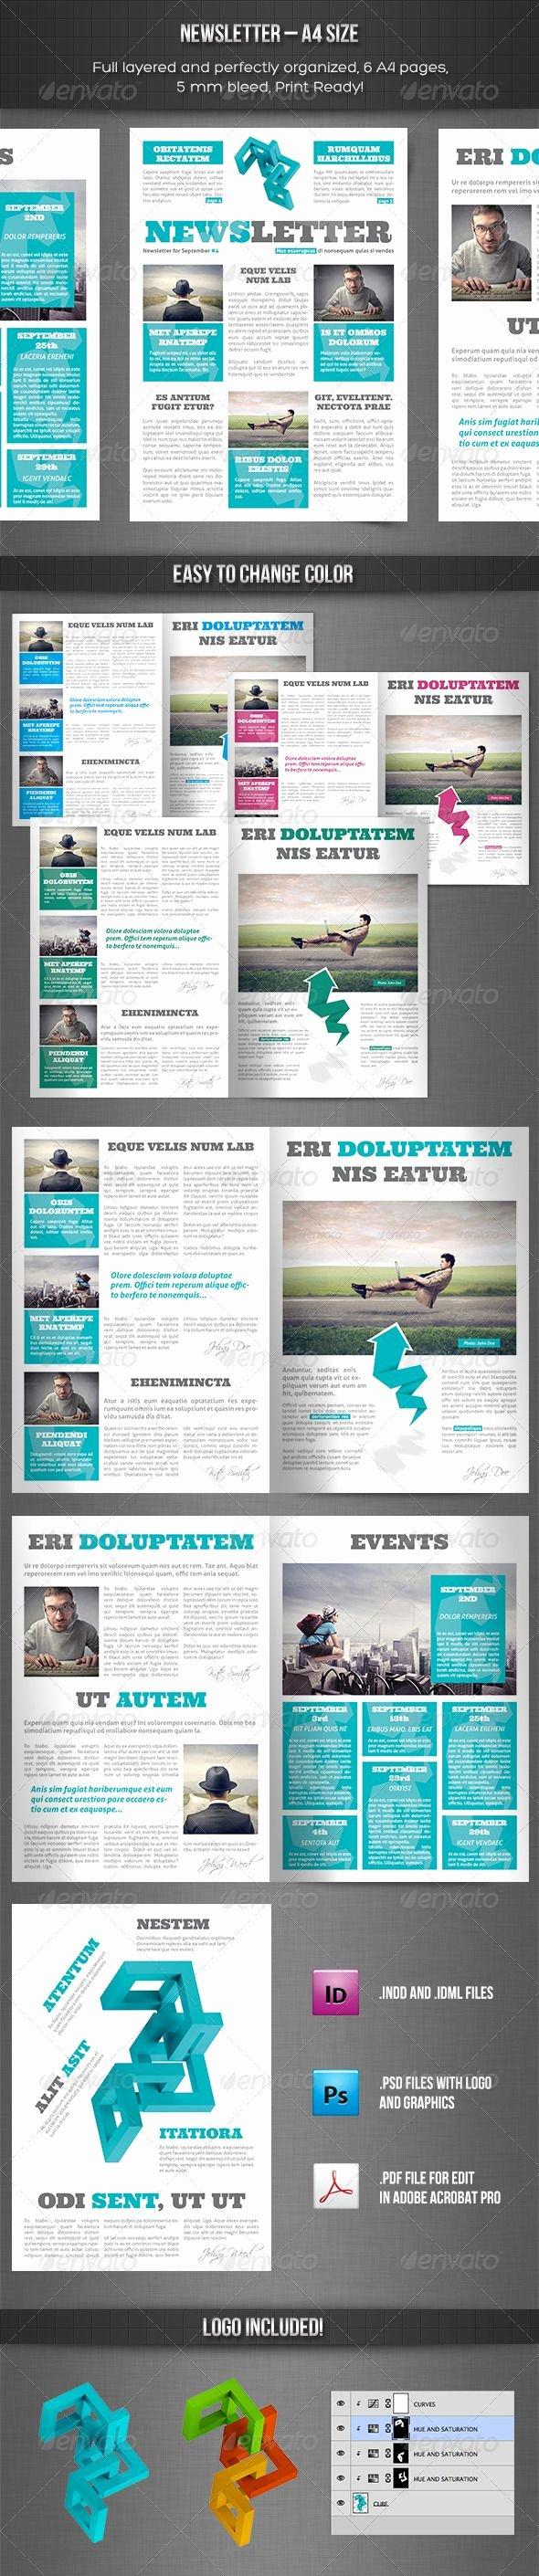 25 Best Ideas About Newsletter Design On Pinterest